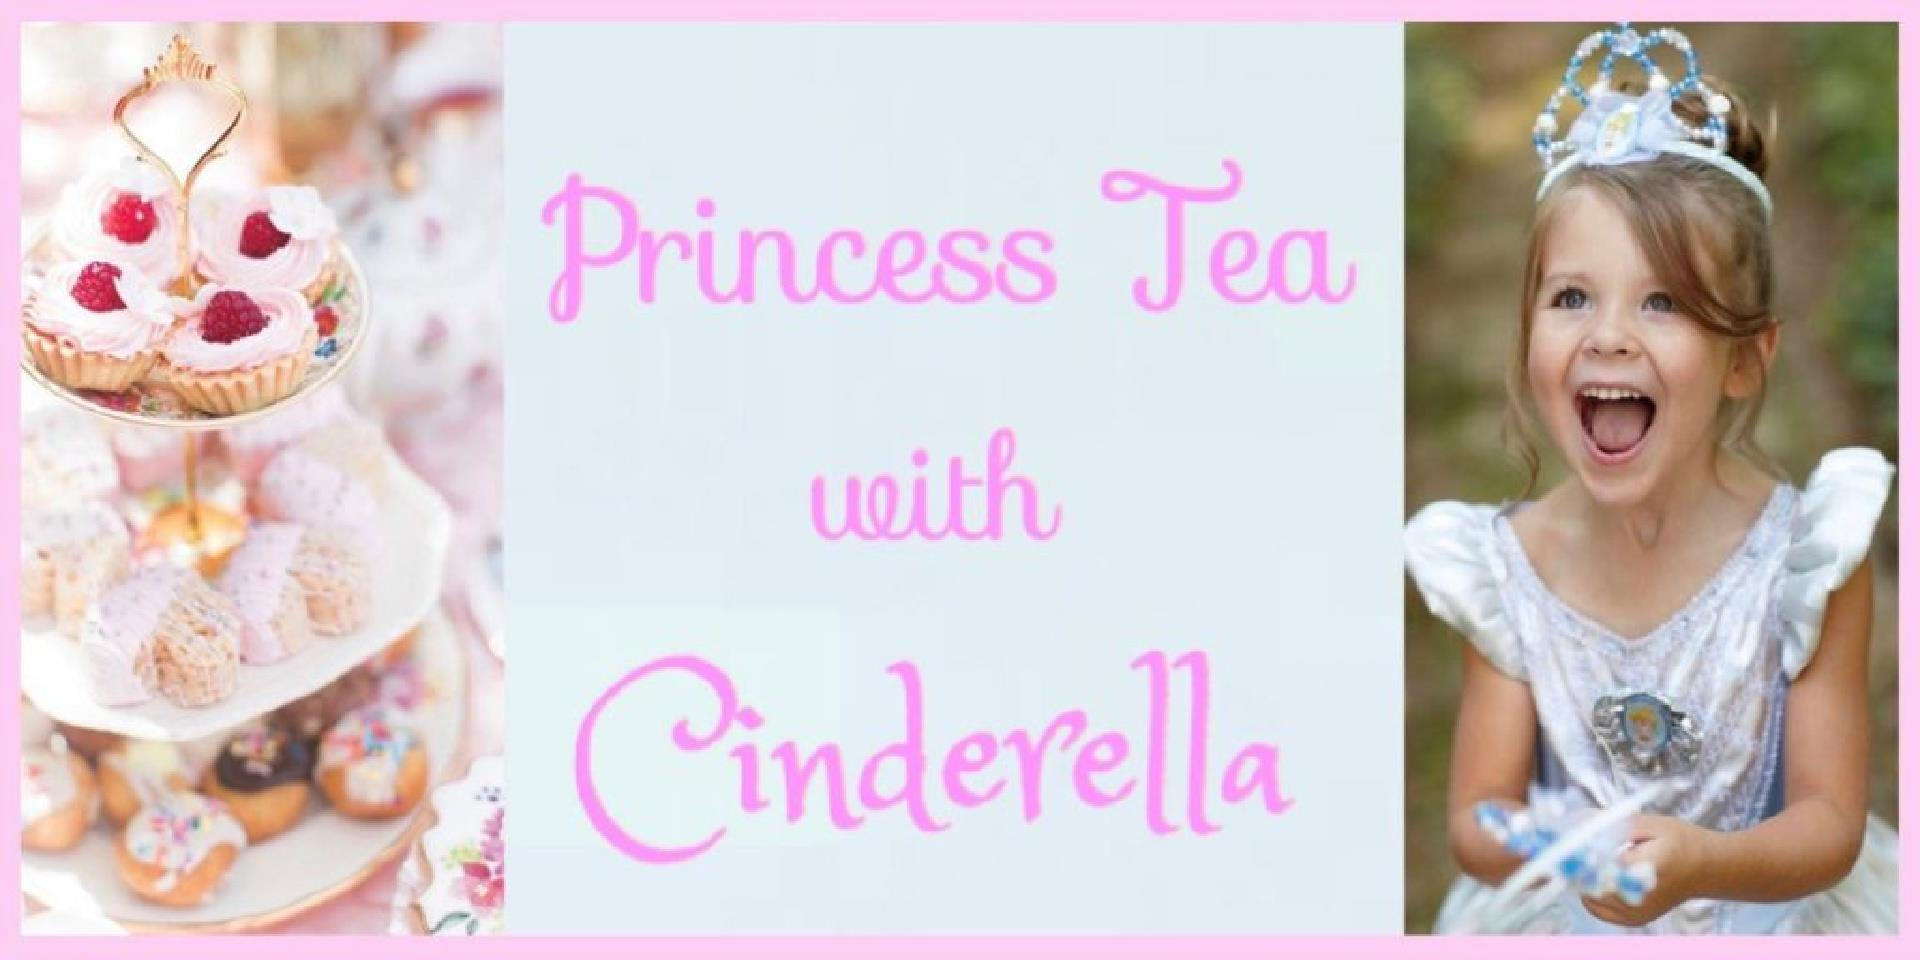 Greensboro Ballet: Princess Tea